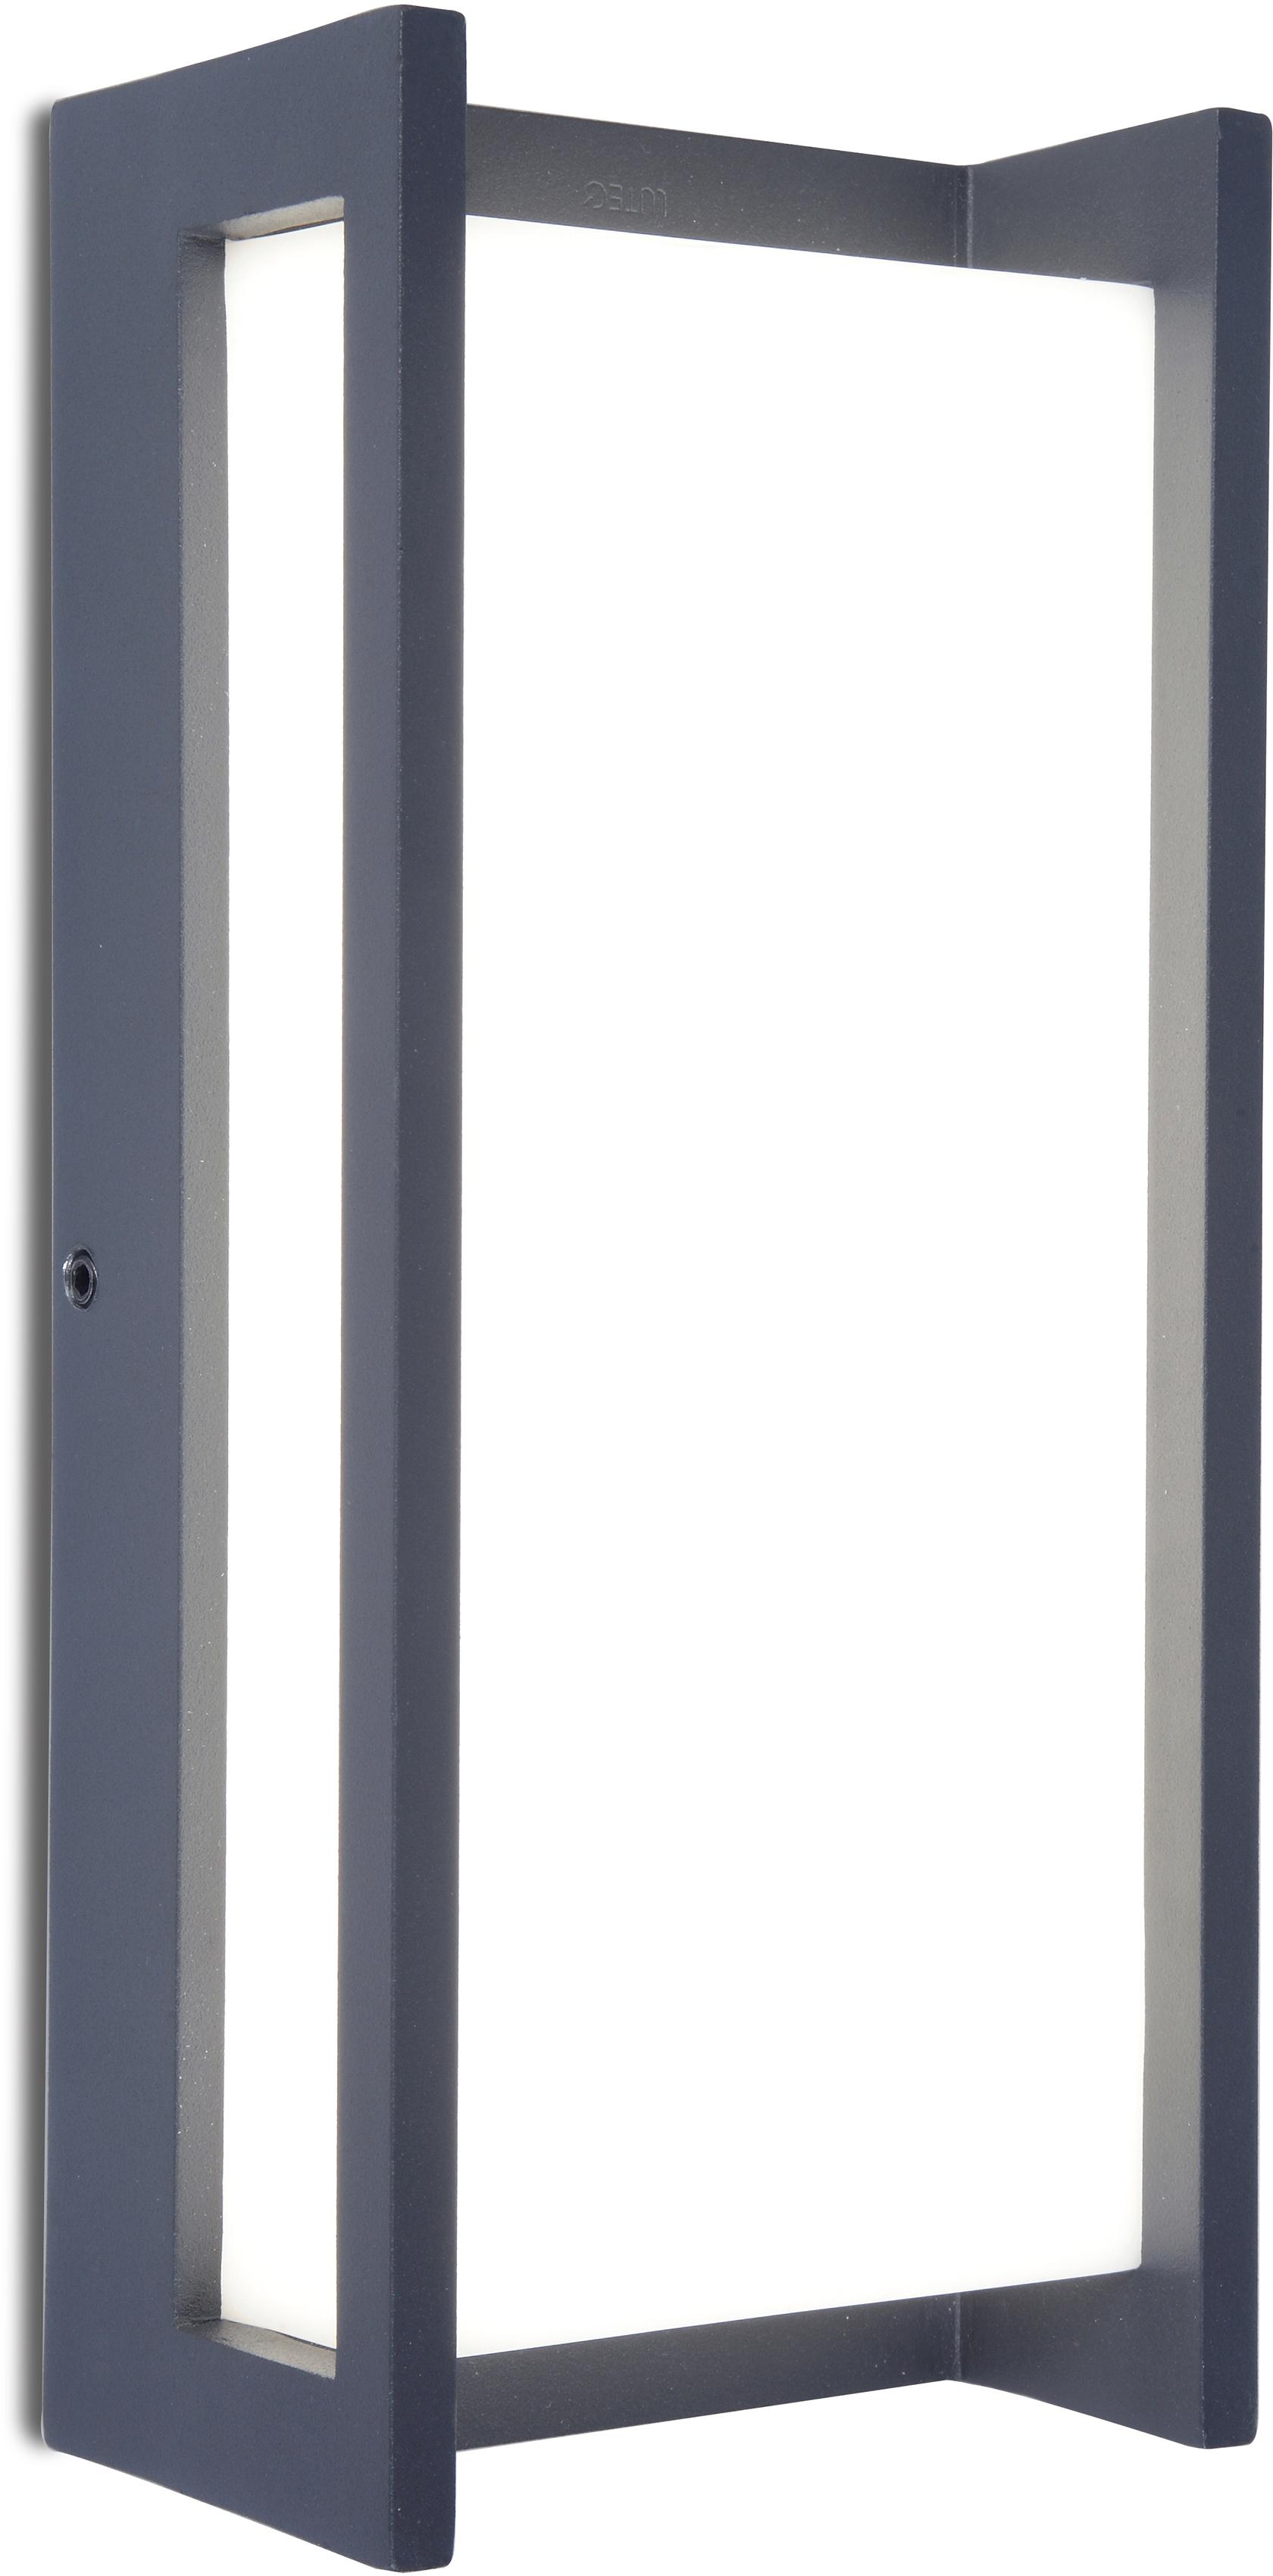 LUTEC LED Außen-Wandleuchte Qubo 5193001118, LED-Modul, 1 St., Warmweiß